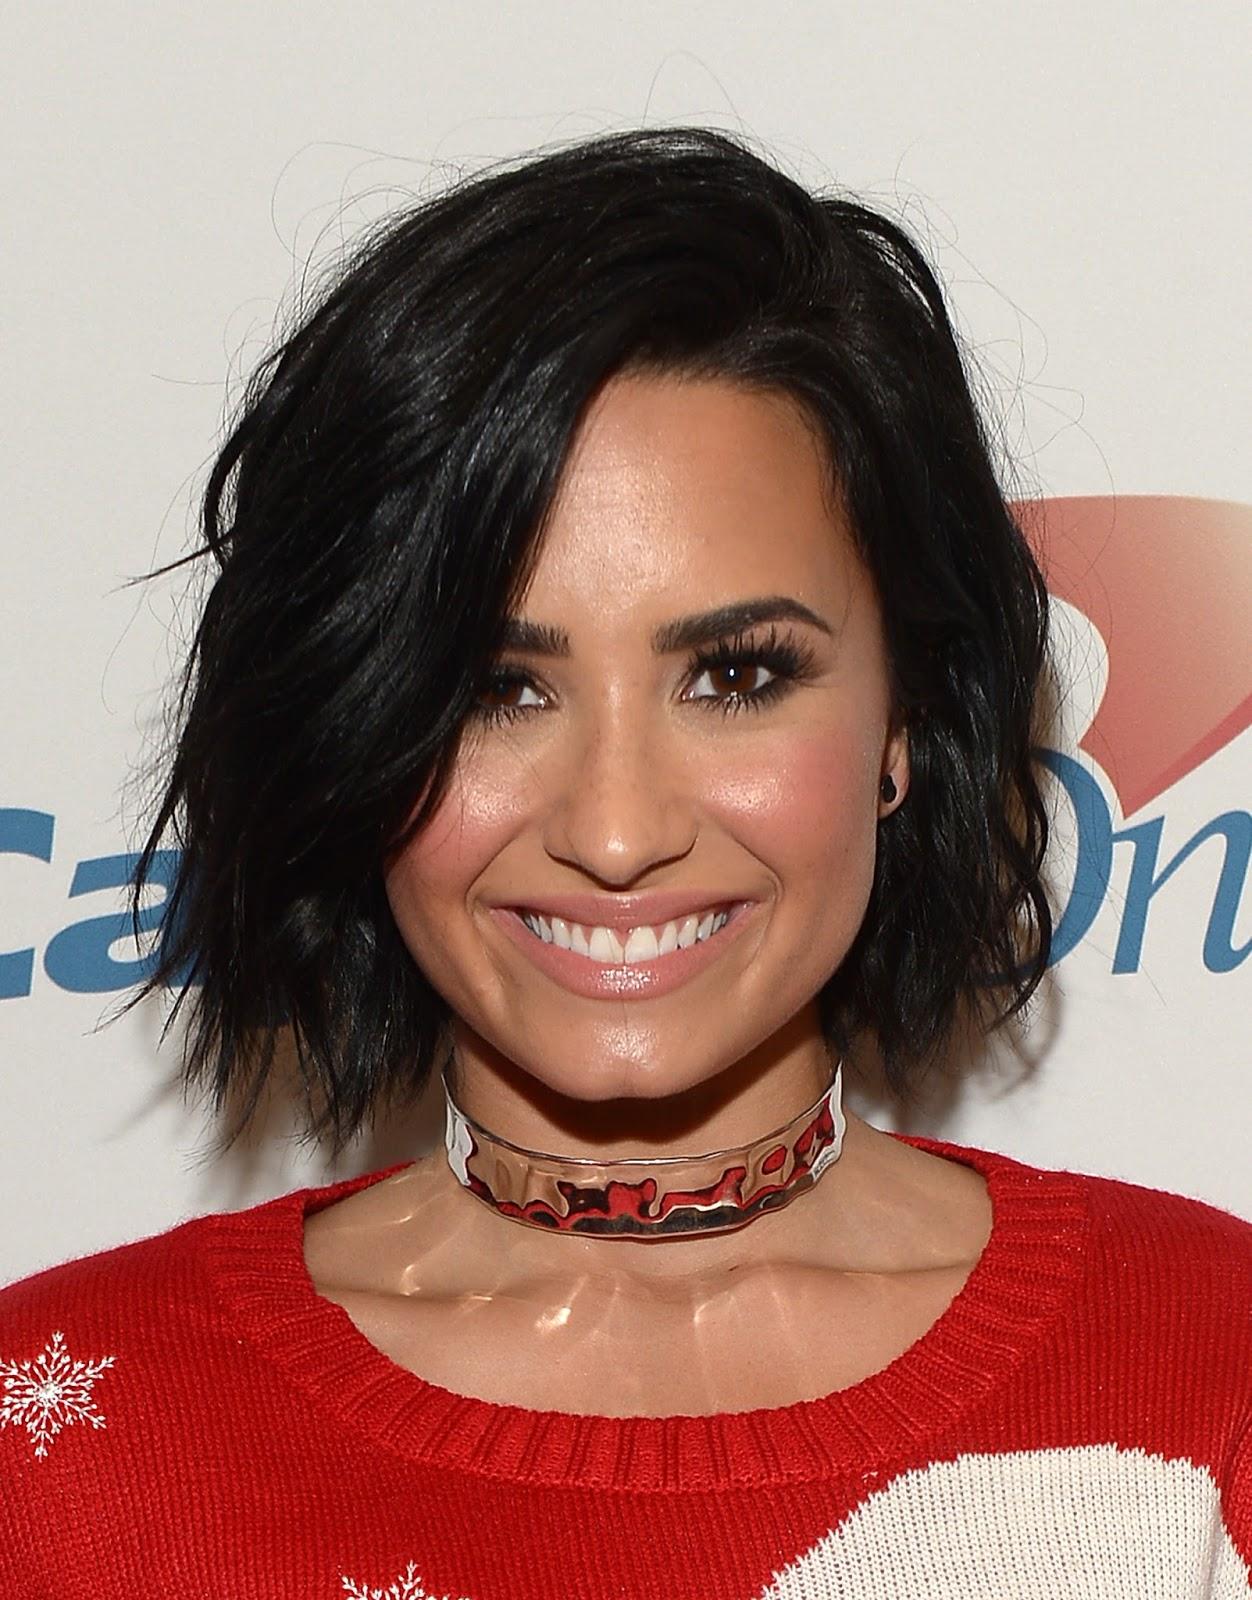 Demi Lovato Sexiest Instagram Pictures: Actress, Singer, Model, @ Demi Lovato